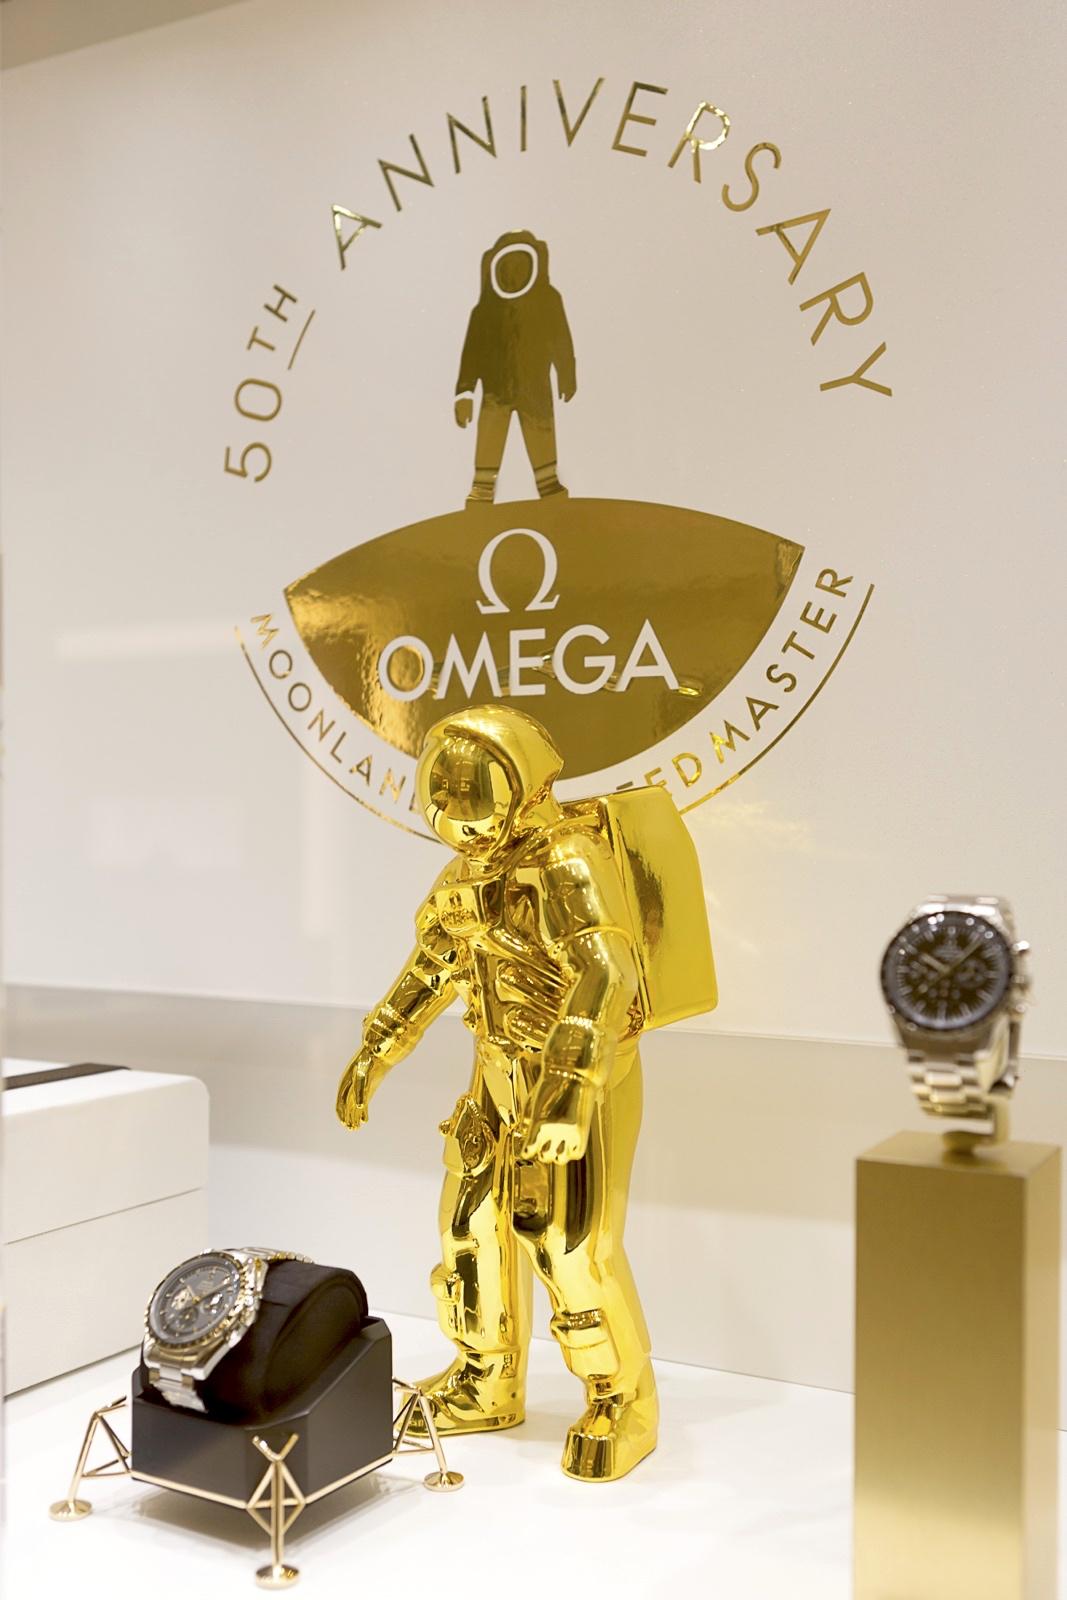 Boutique Omega Apollo 11